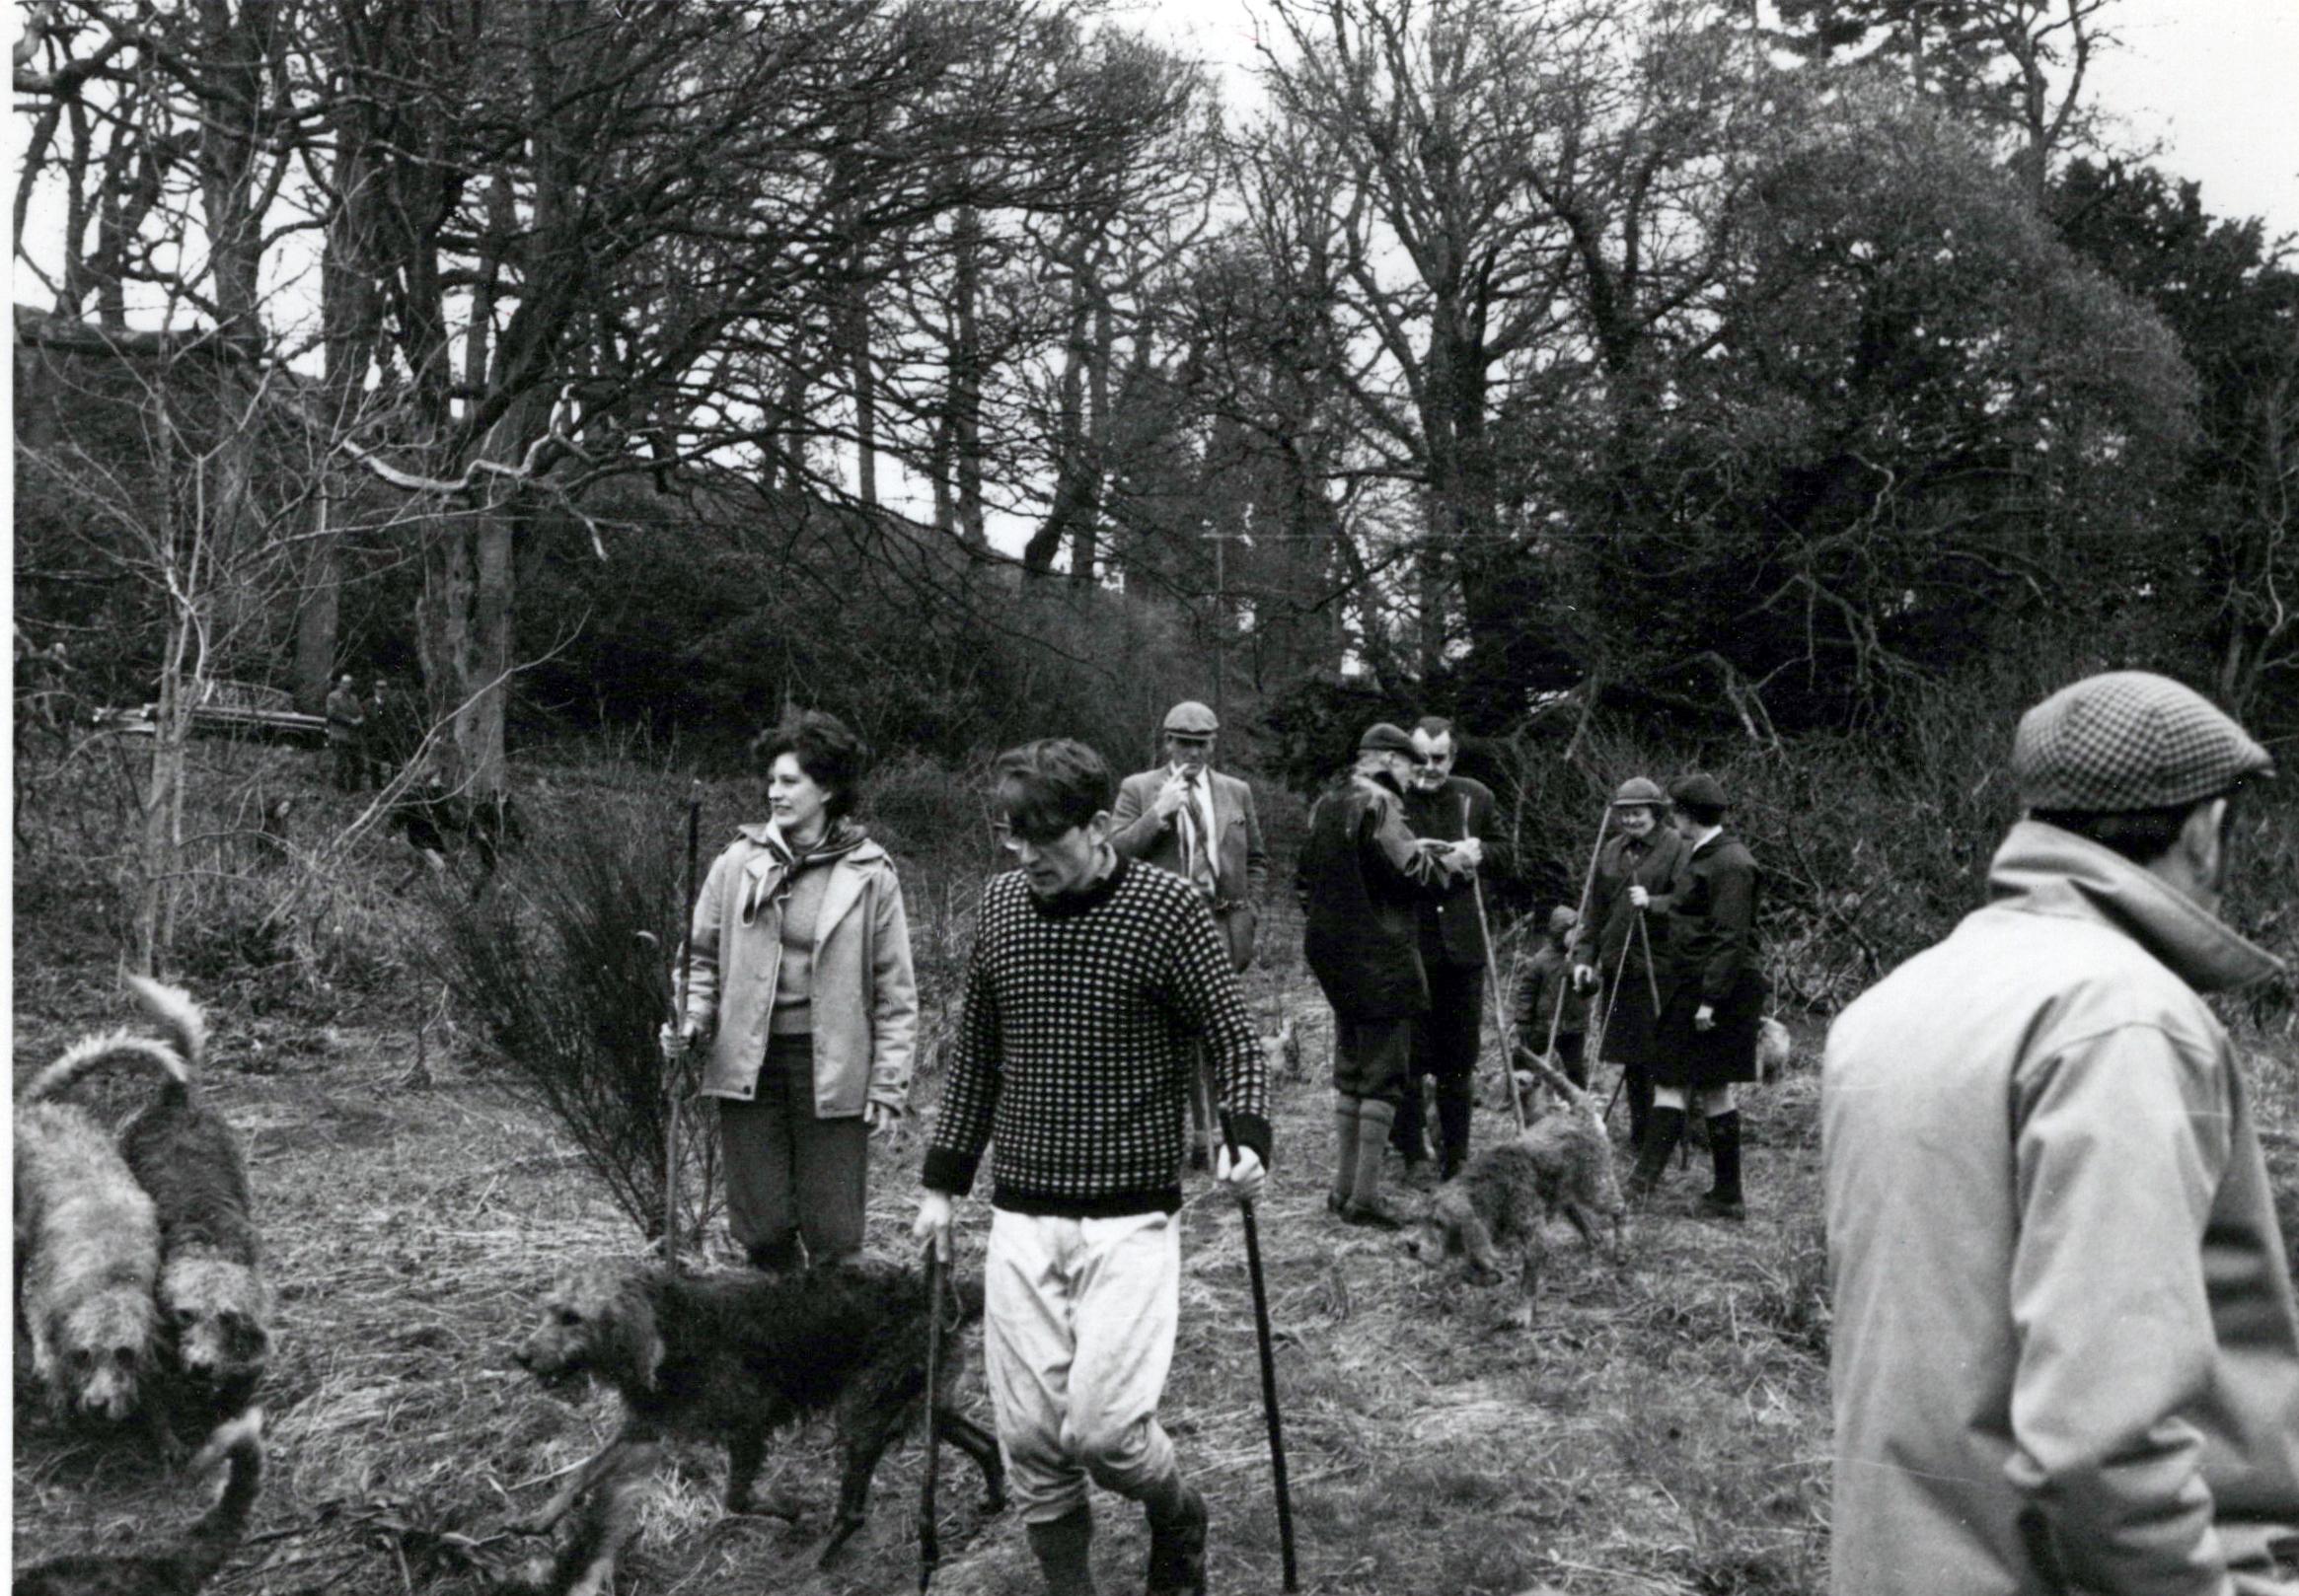 1970_Mei_Otterhound-Schotland_0001_a